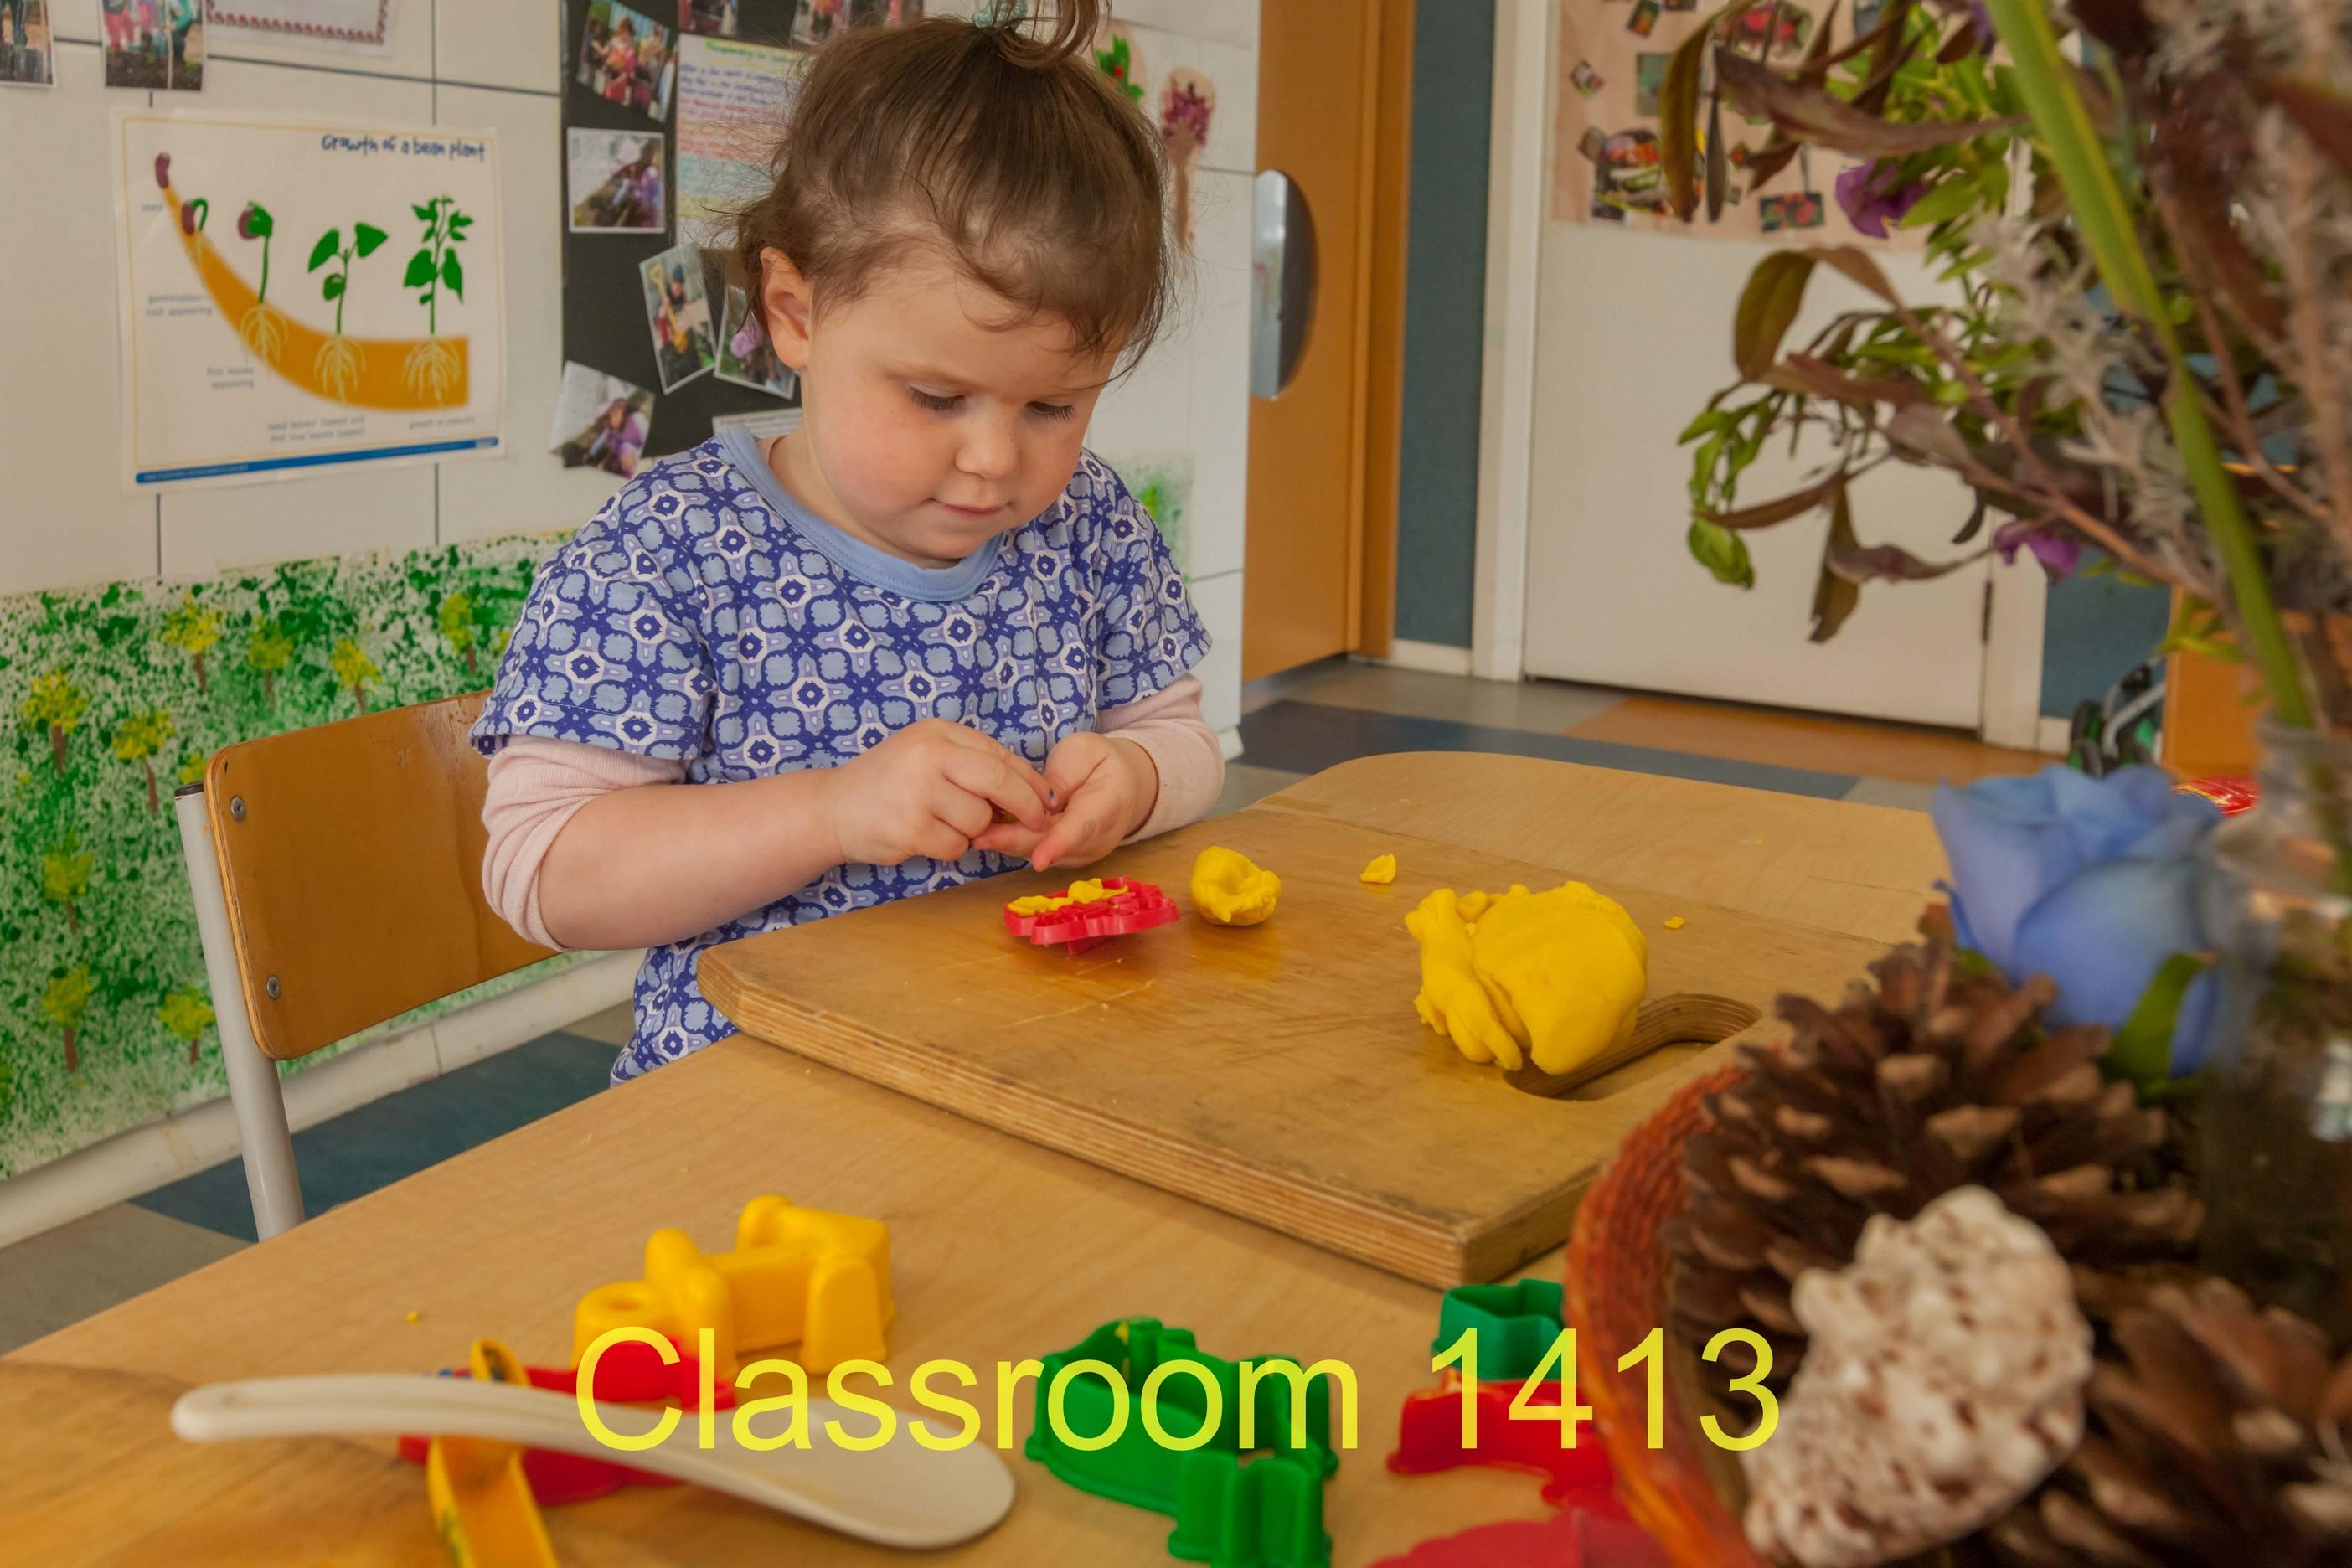 Classroom 1413